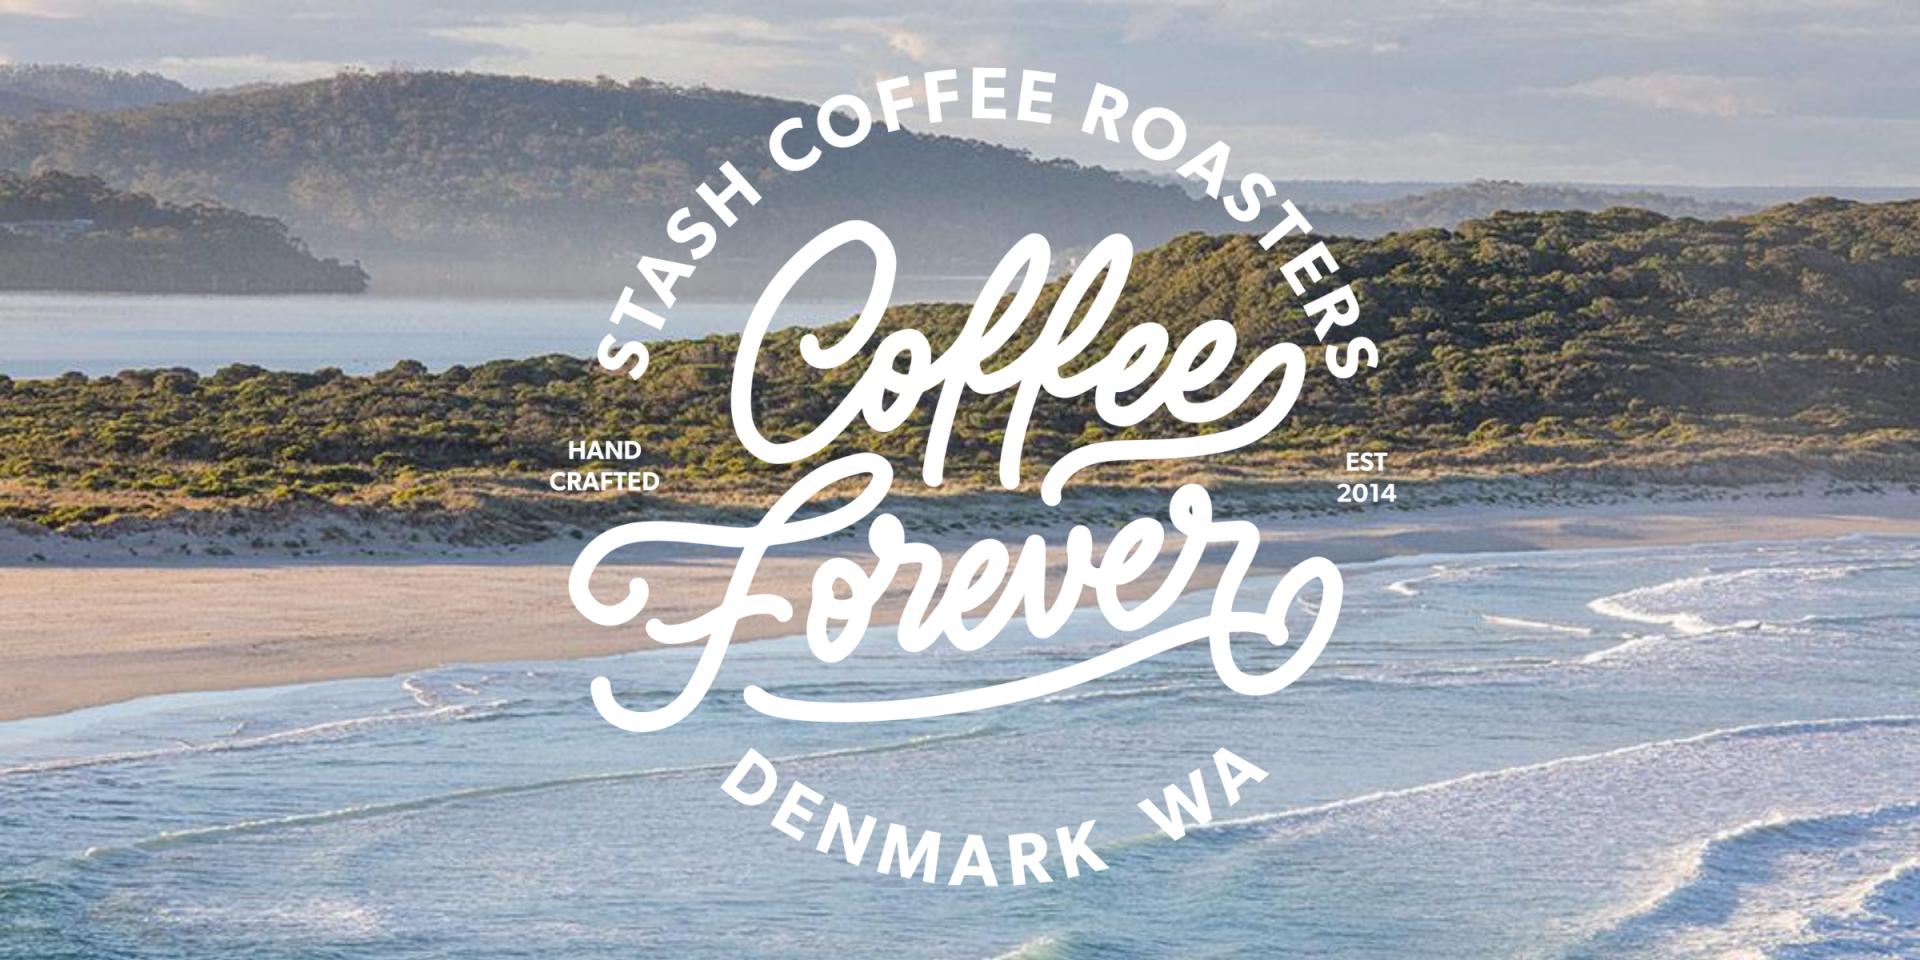 Stash Coffee Denmark Western Australia